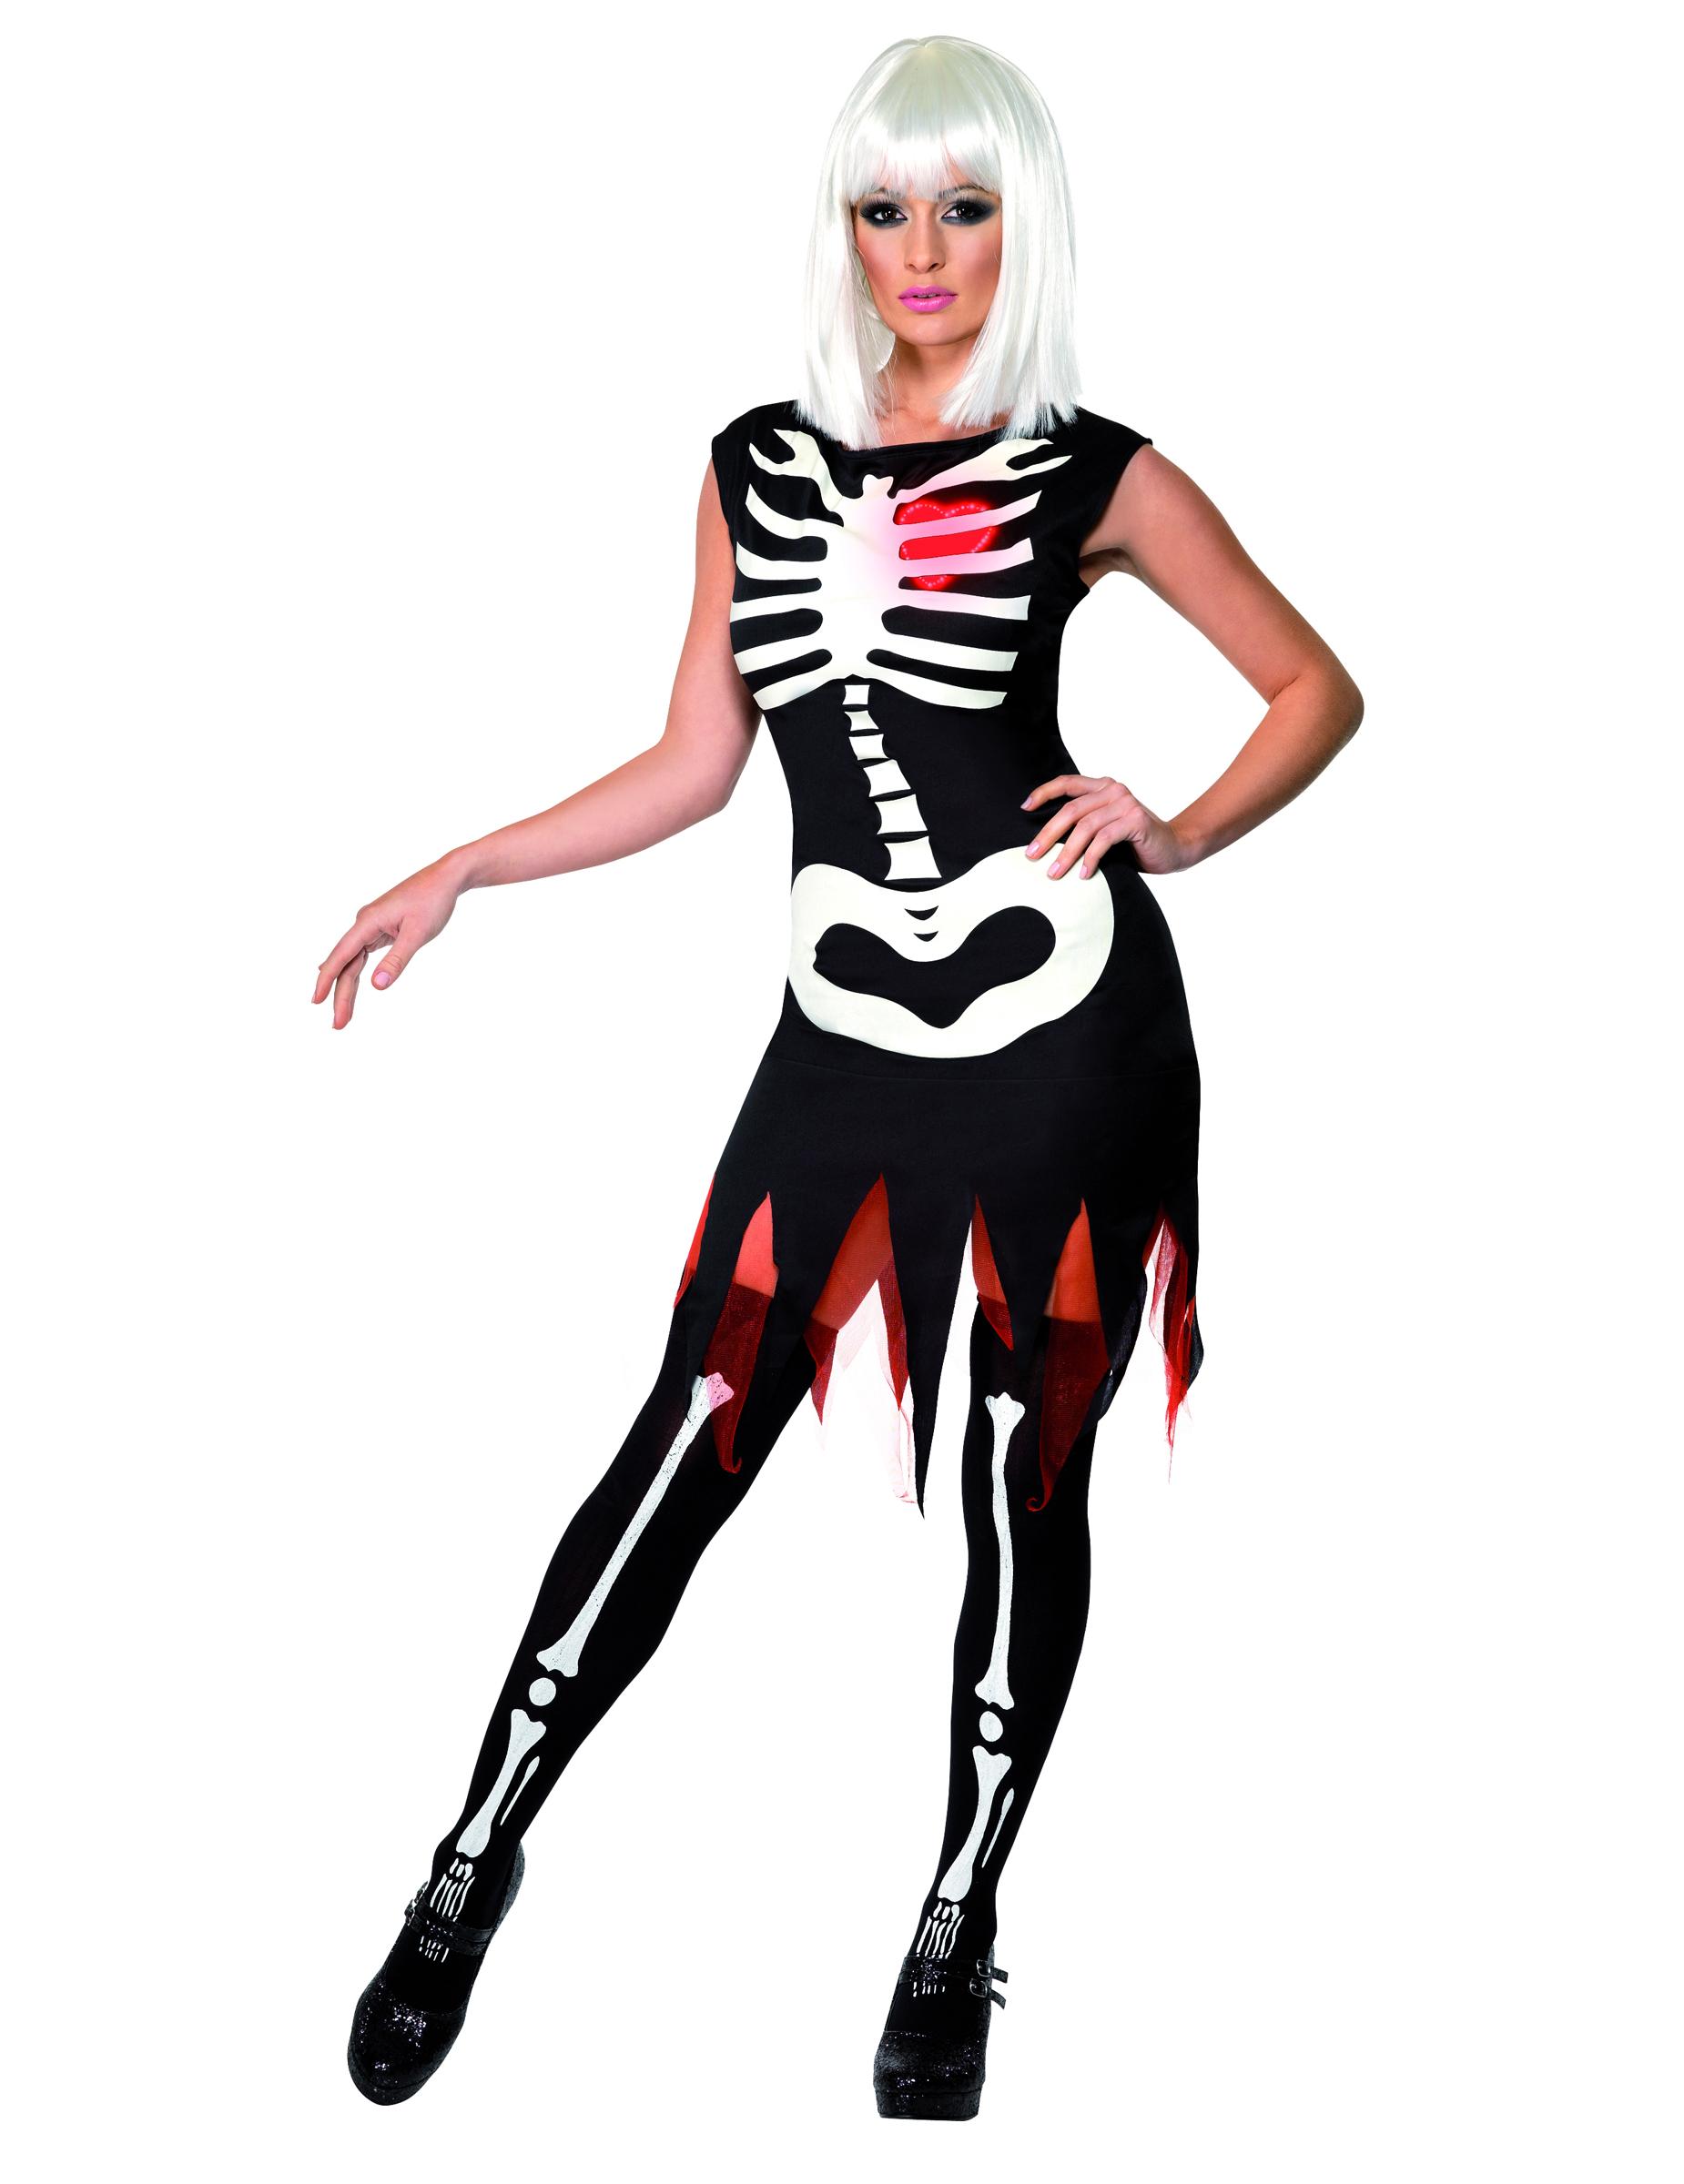 skelettkost m halloween f r damen kost me f r erwachsene und g nstige faschingskost me vegaoo. Black Bedroom Furniture Sets. Home Design Ideas